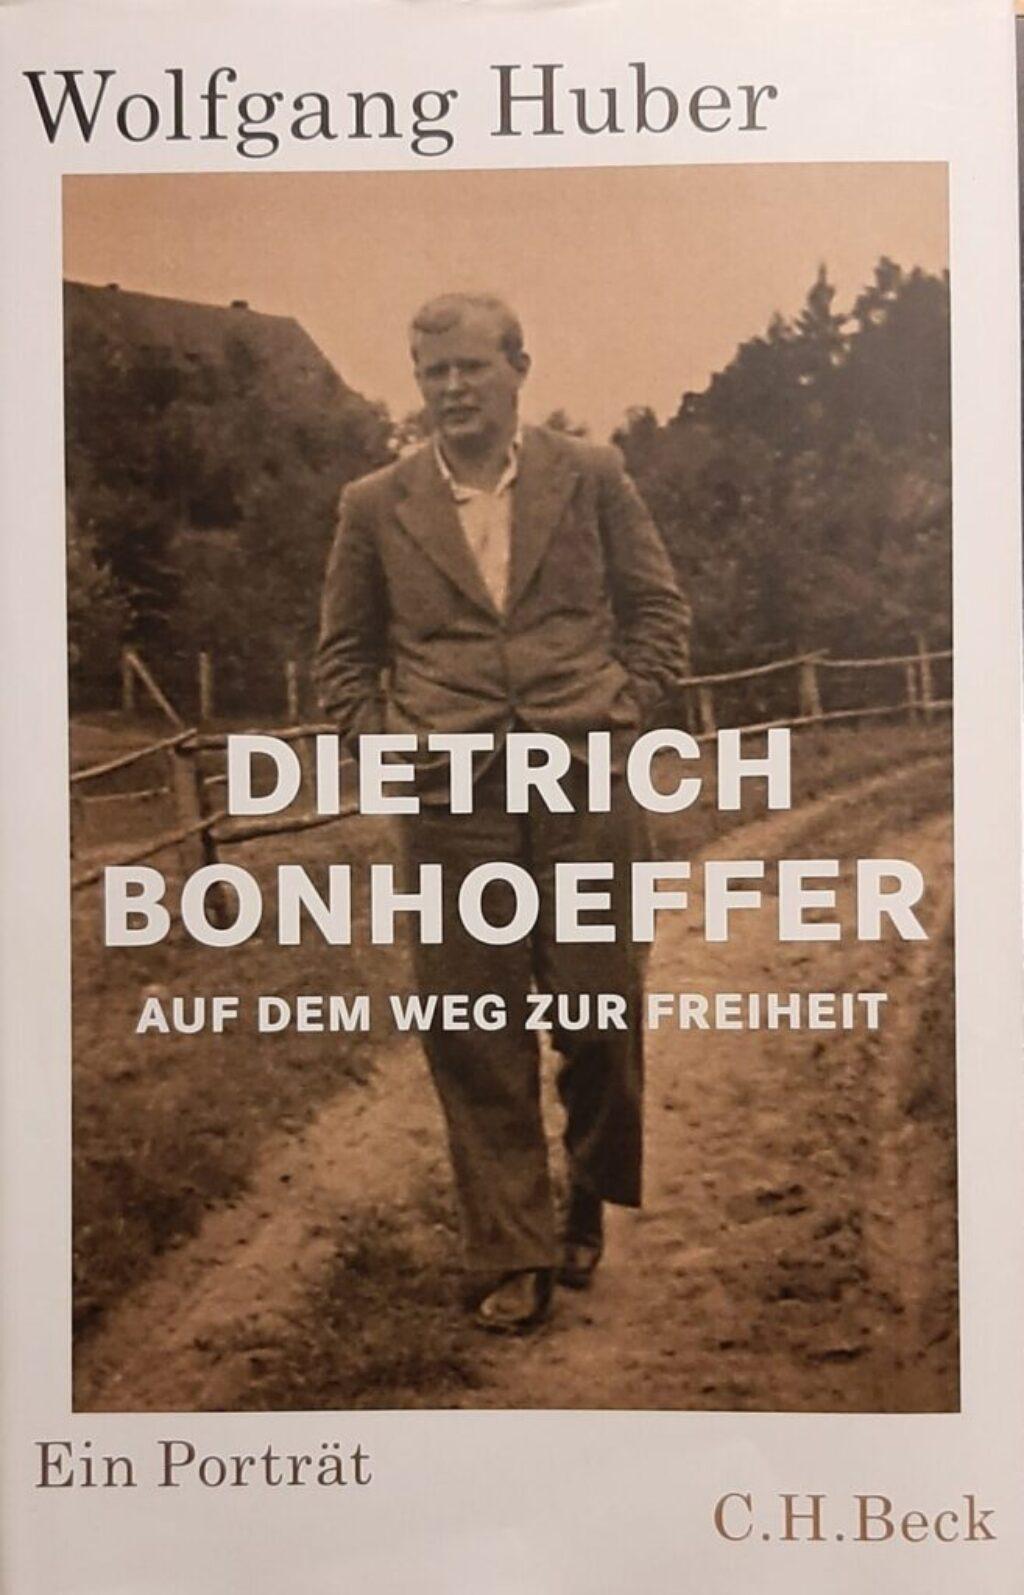 Bonhoeffer-Buch_WH